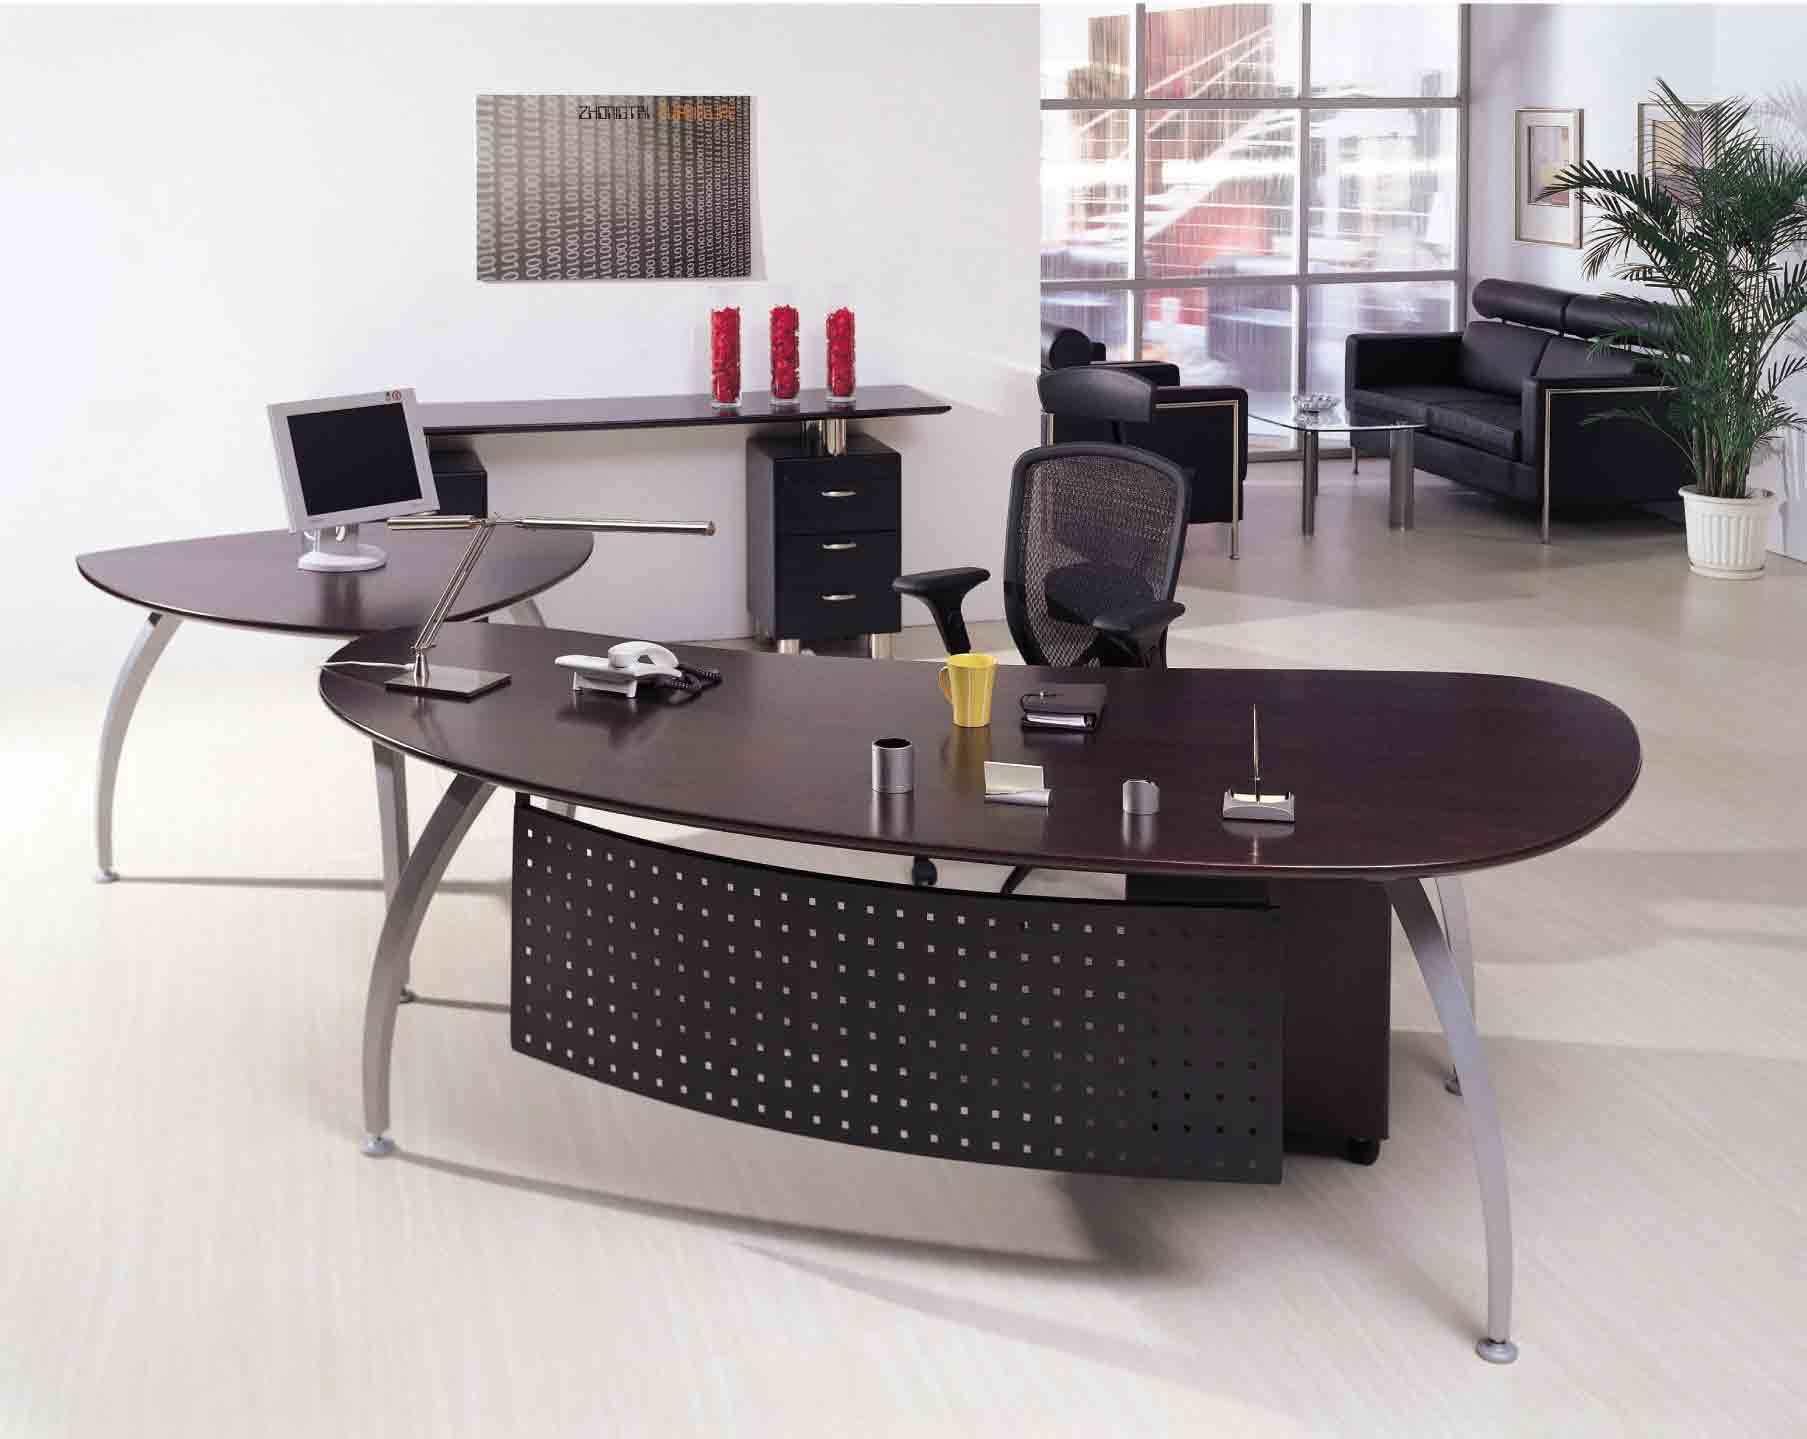 Modern Office Furniture U Shape Brown Executive Office Desk (NS-ND024)